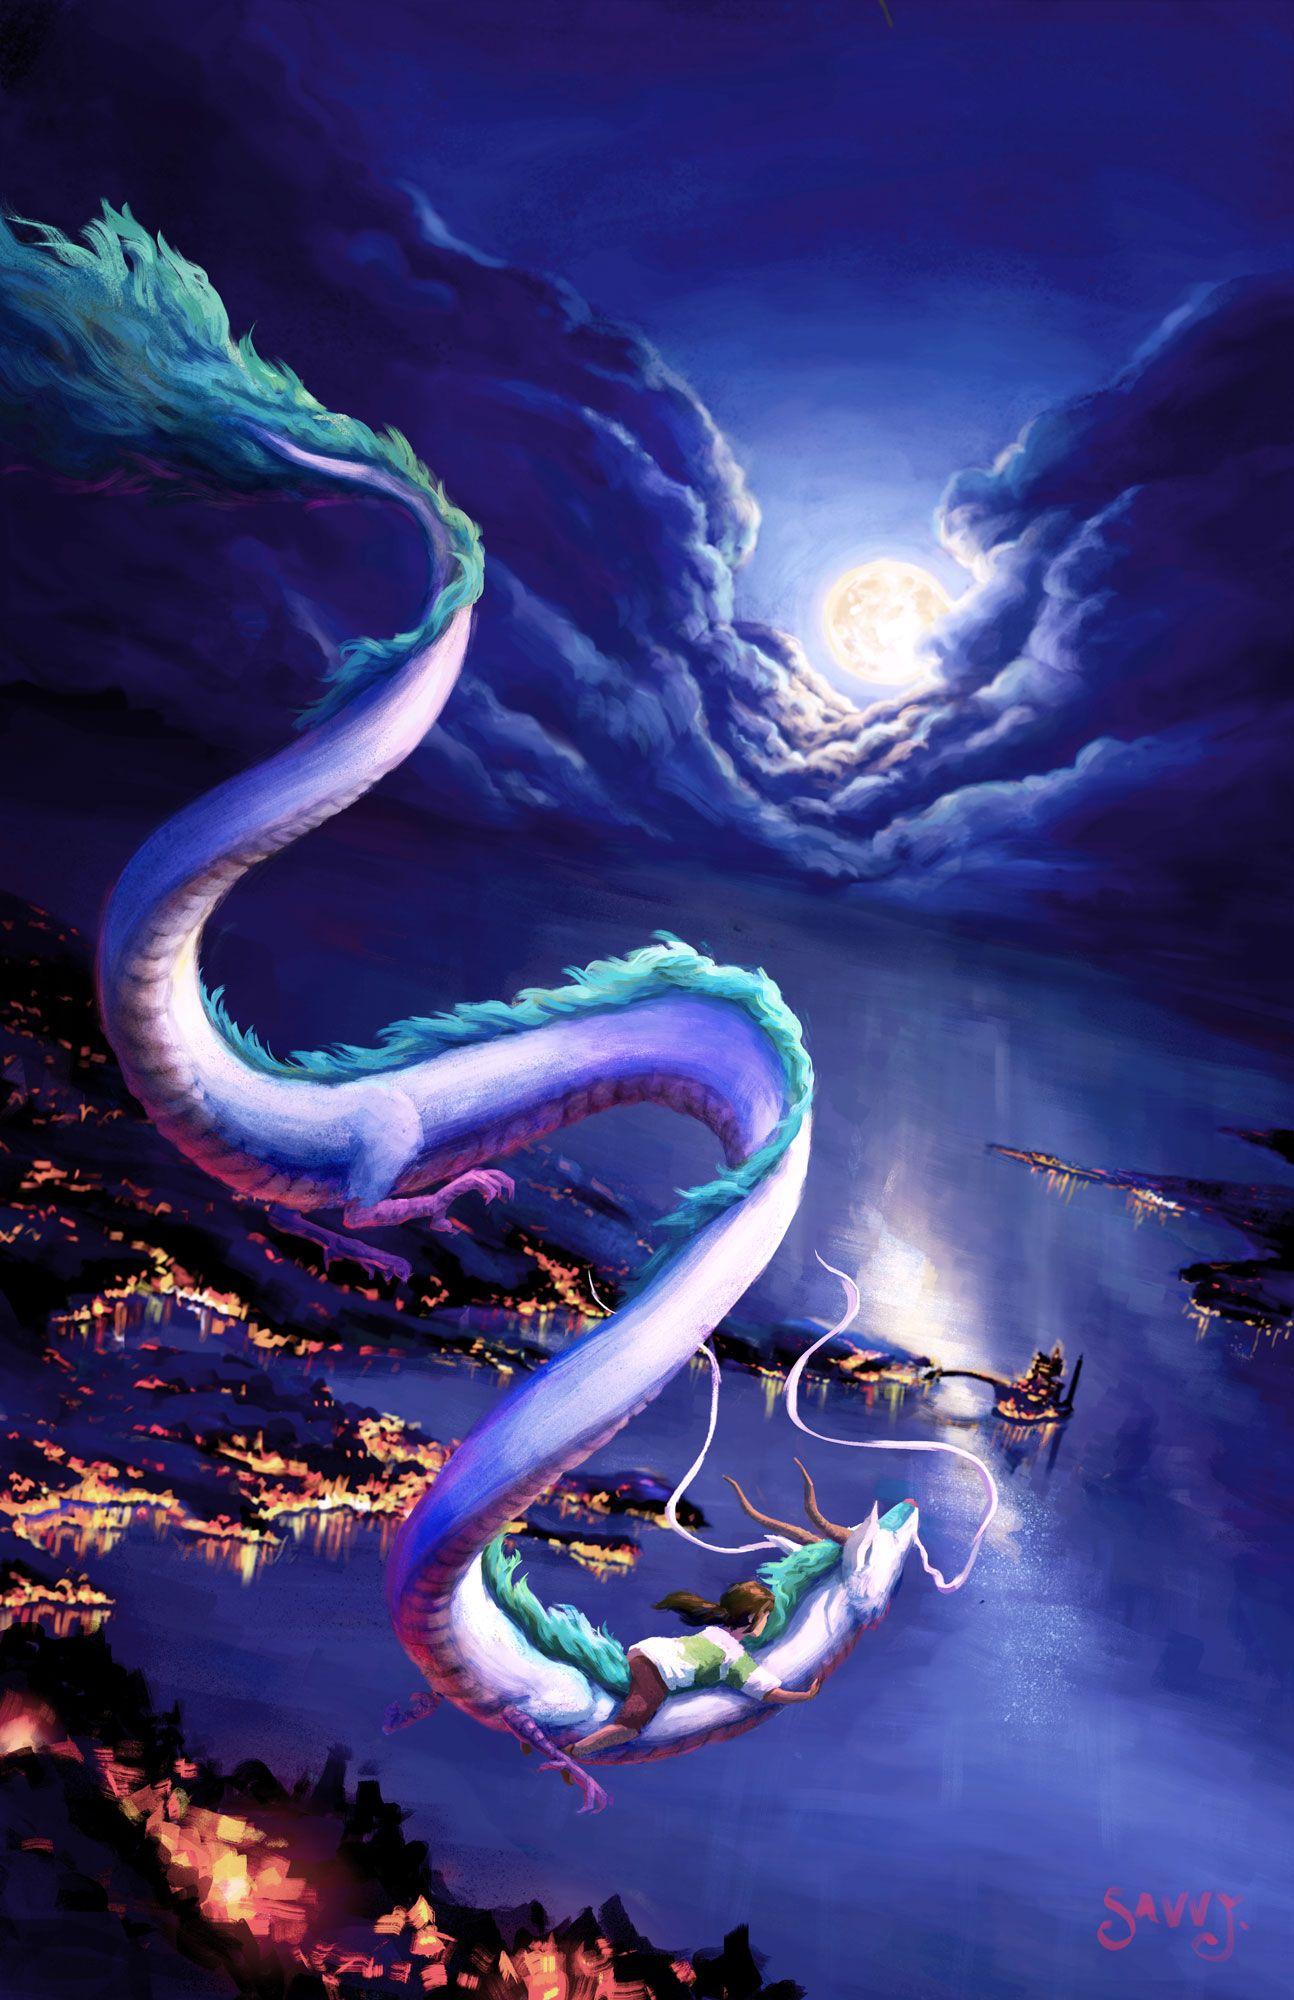 Flying On The River Spirit Art Print Etsy In 2020 Studio Ghibli Spirited Away Studio Ghibli Fanart Studio Ghibli Art